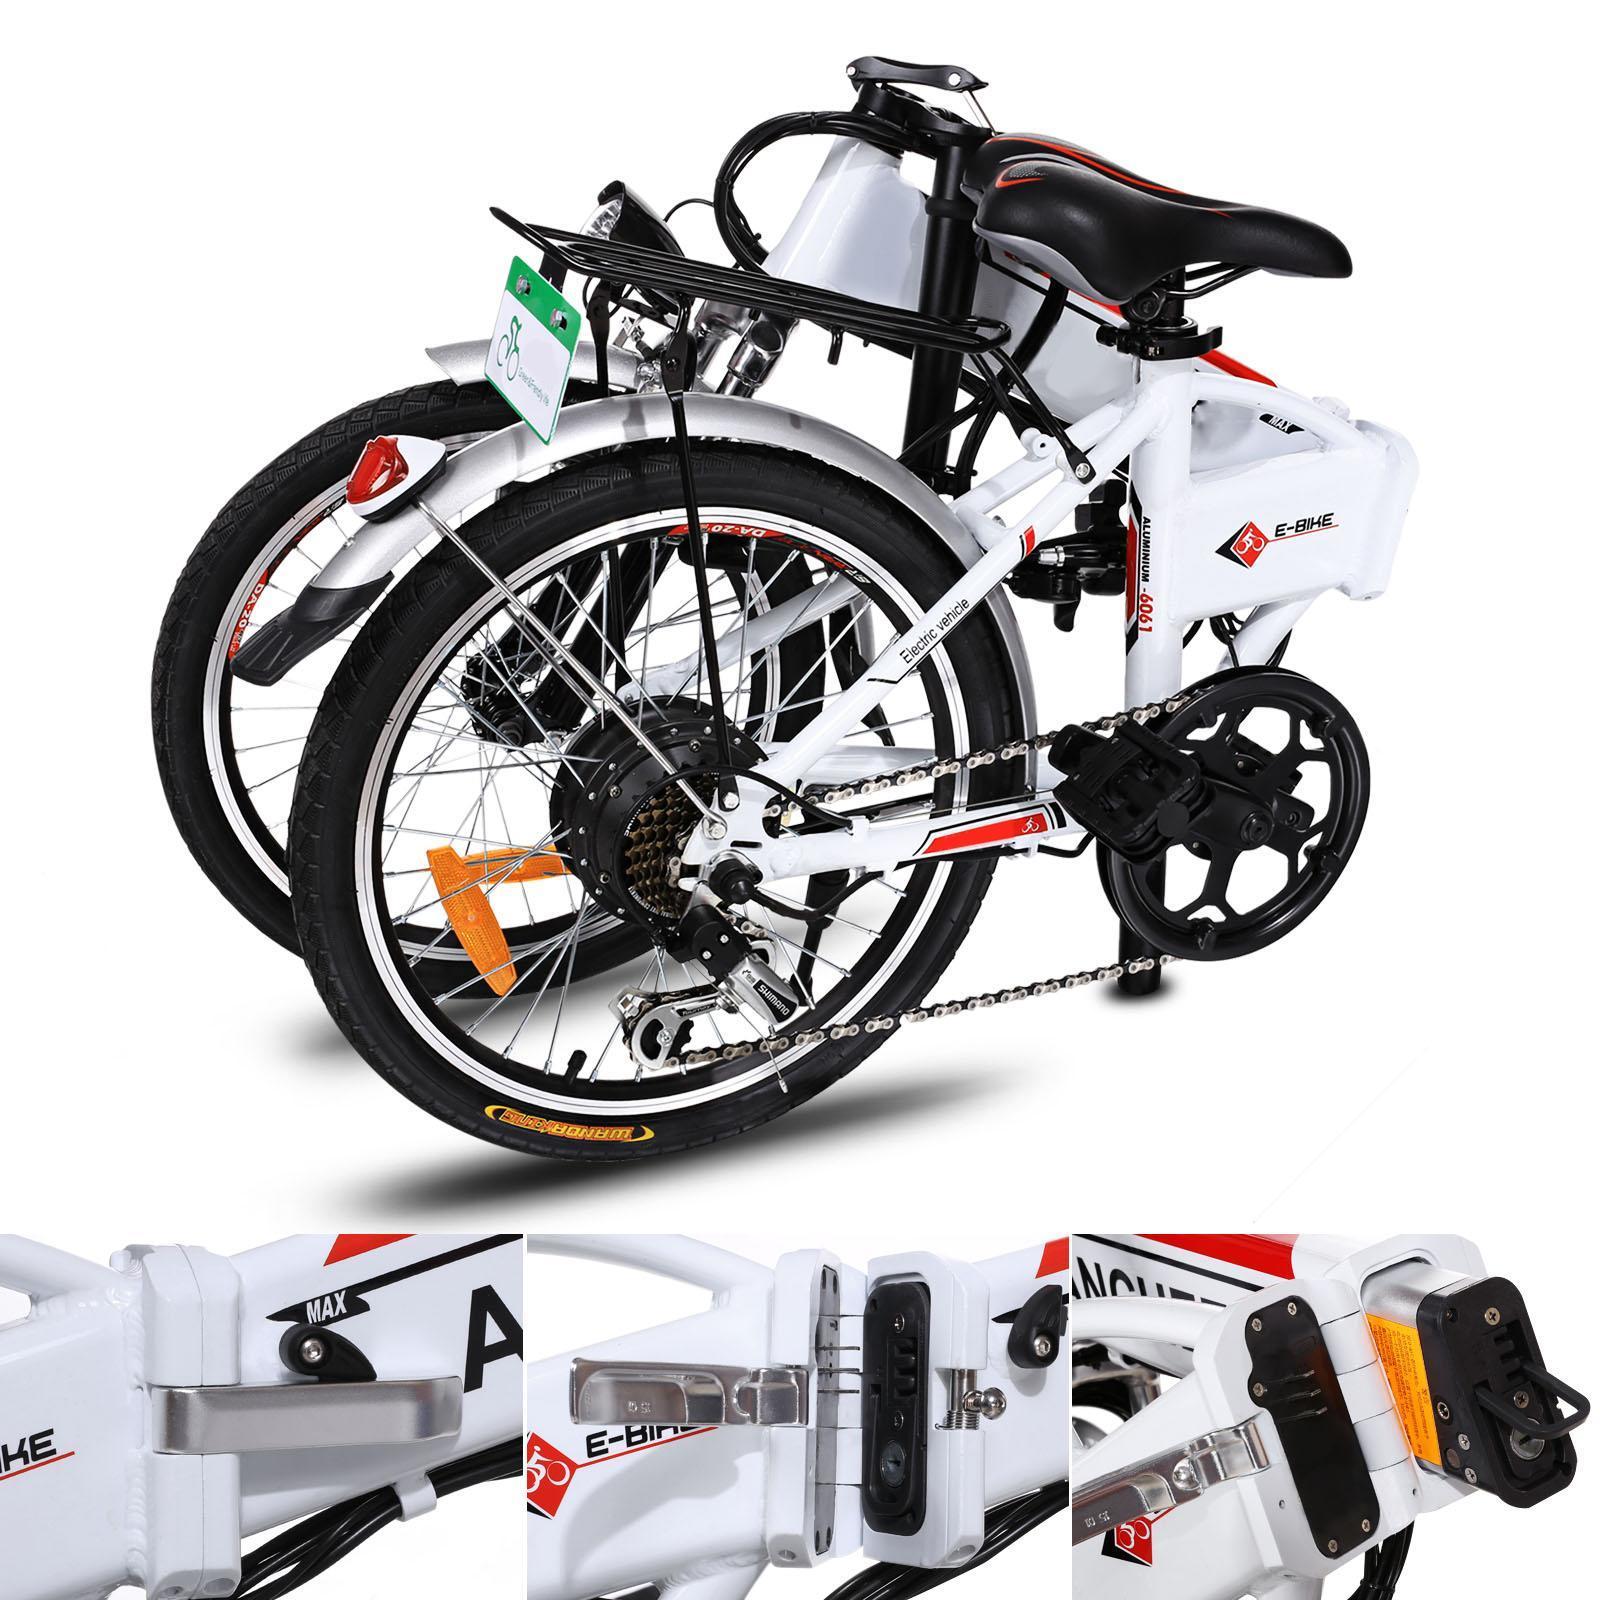 18.7 inch Wheel Aluminum Alloy Frame Folding Mountain Bike Cycling Bicycle White 2